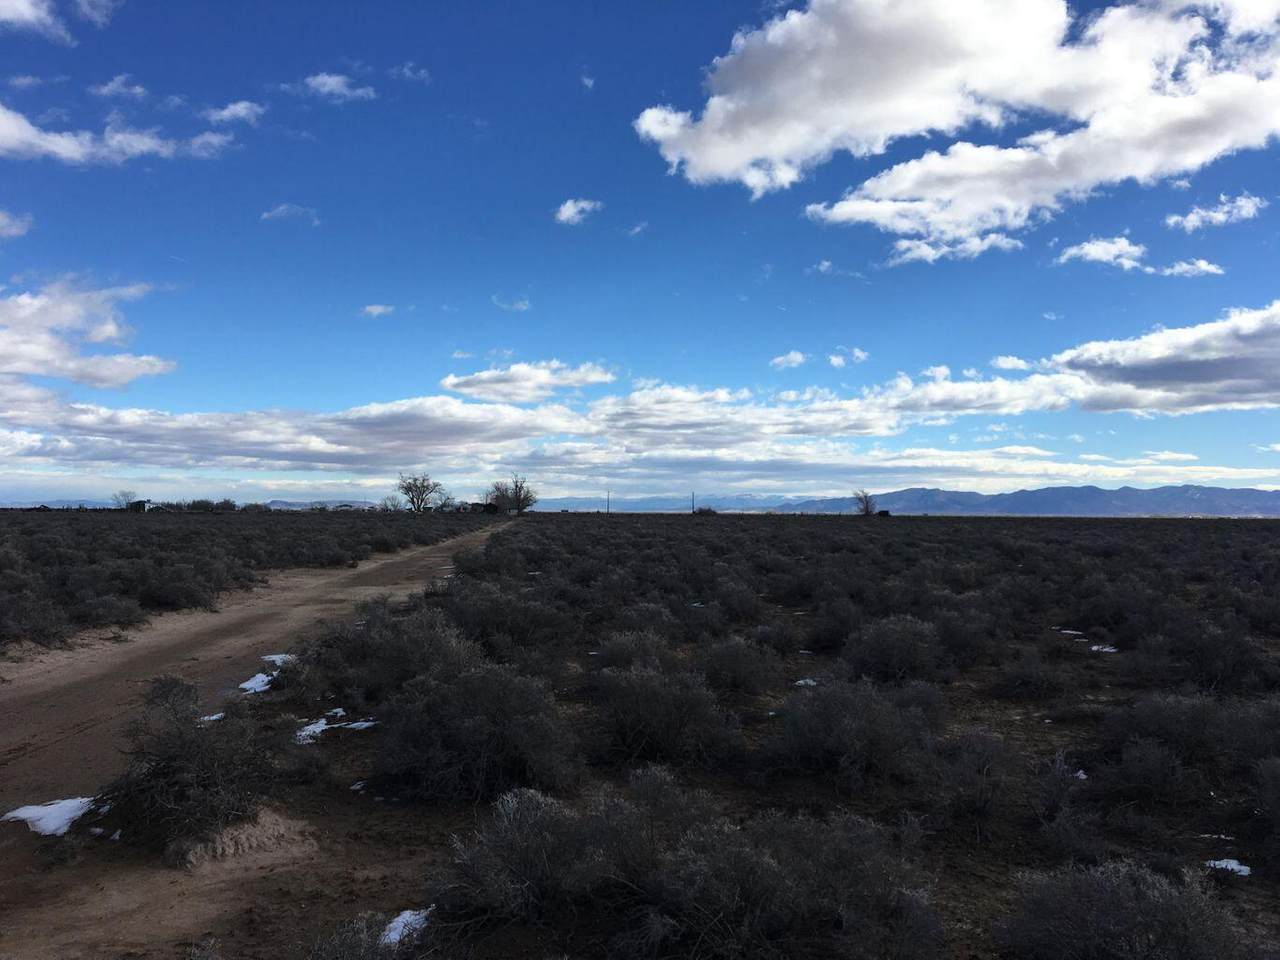 Lot 1284 Unit 2 - Garden Valley Ranchos - Photo 1